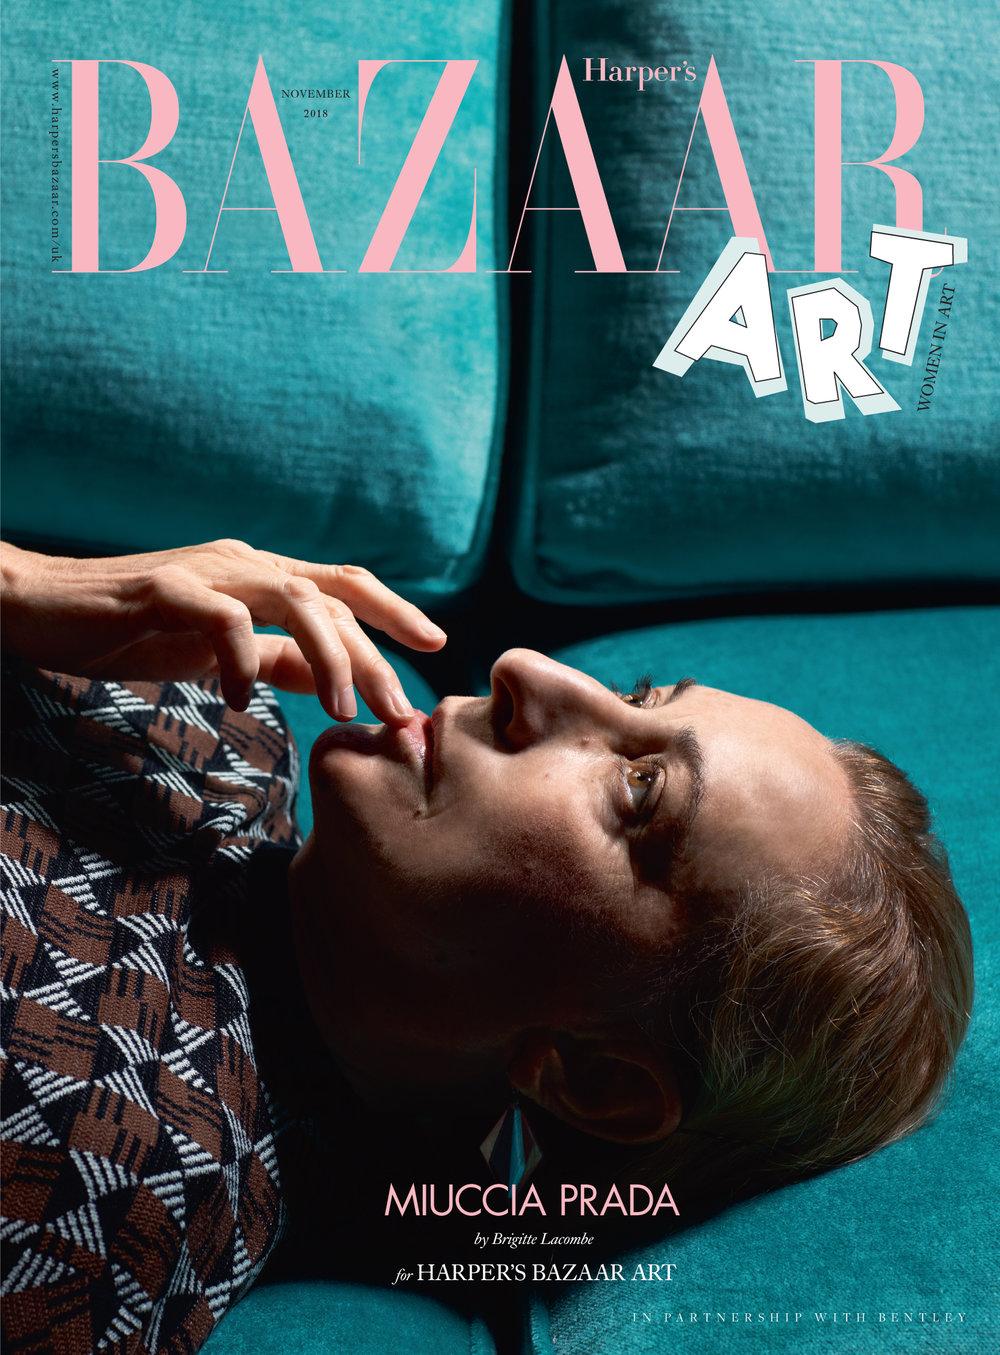 Miuccia Prada, St. Moritz, 2018